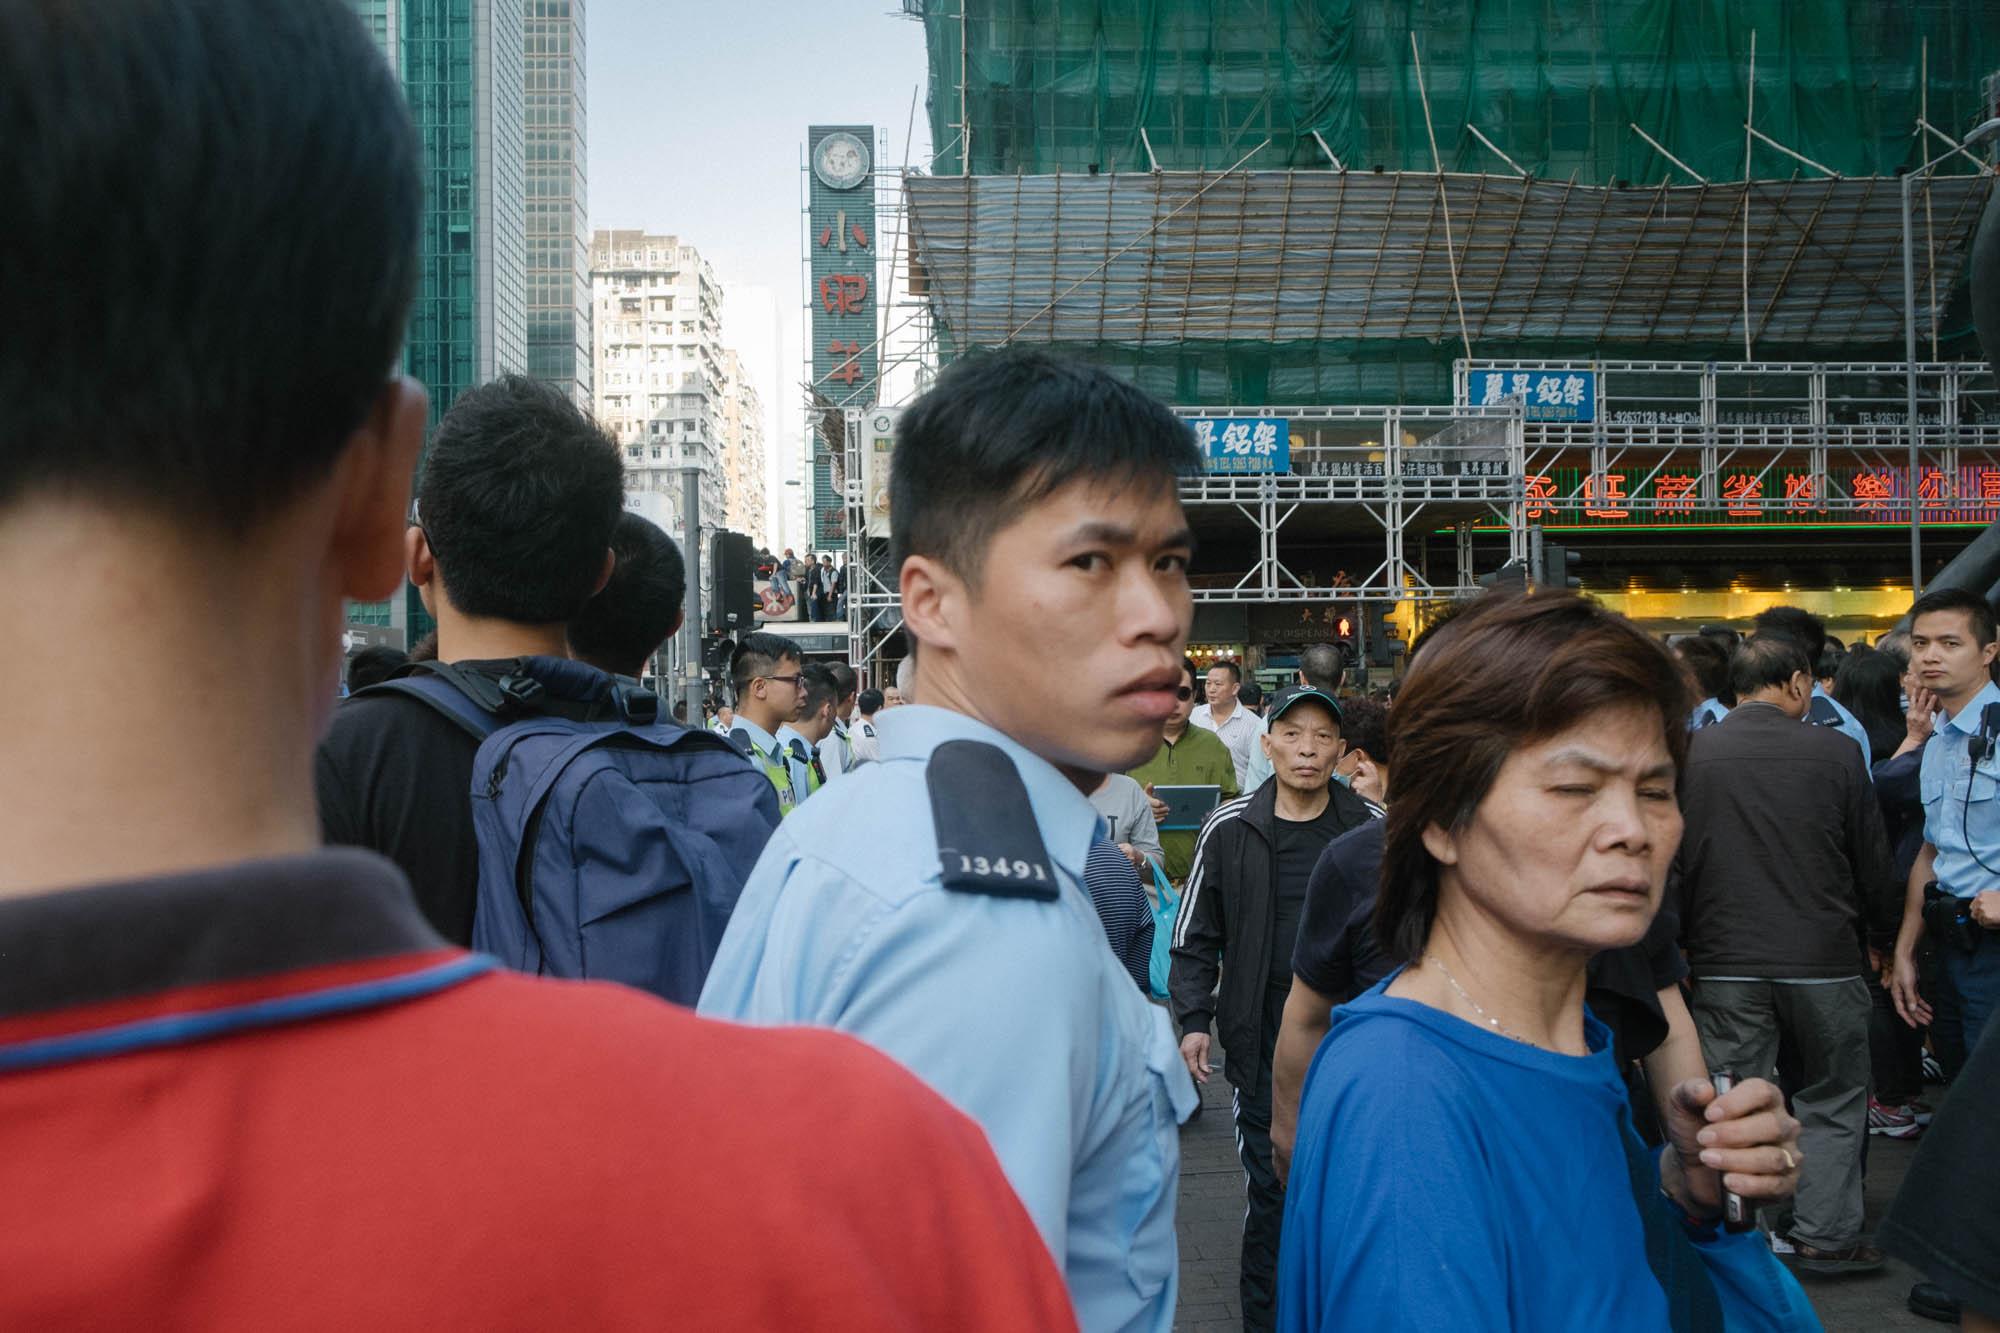 Hong Kong Umbrella Revolution (2014) Digital